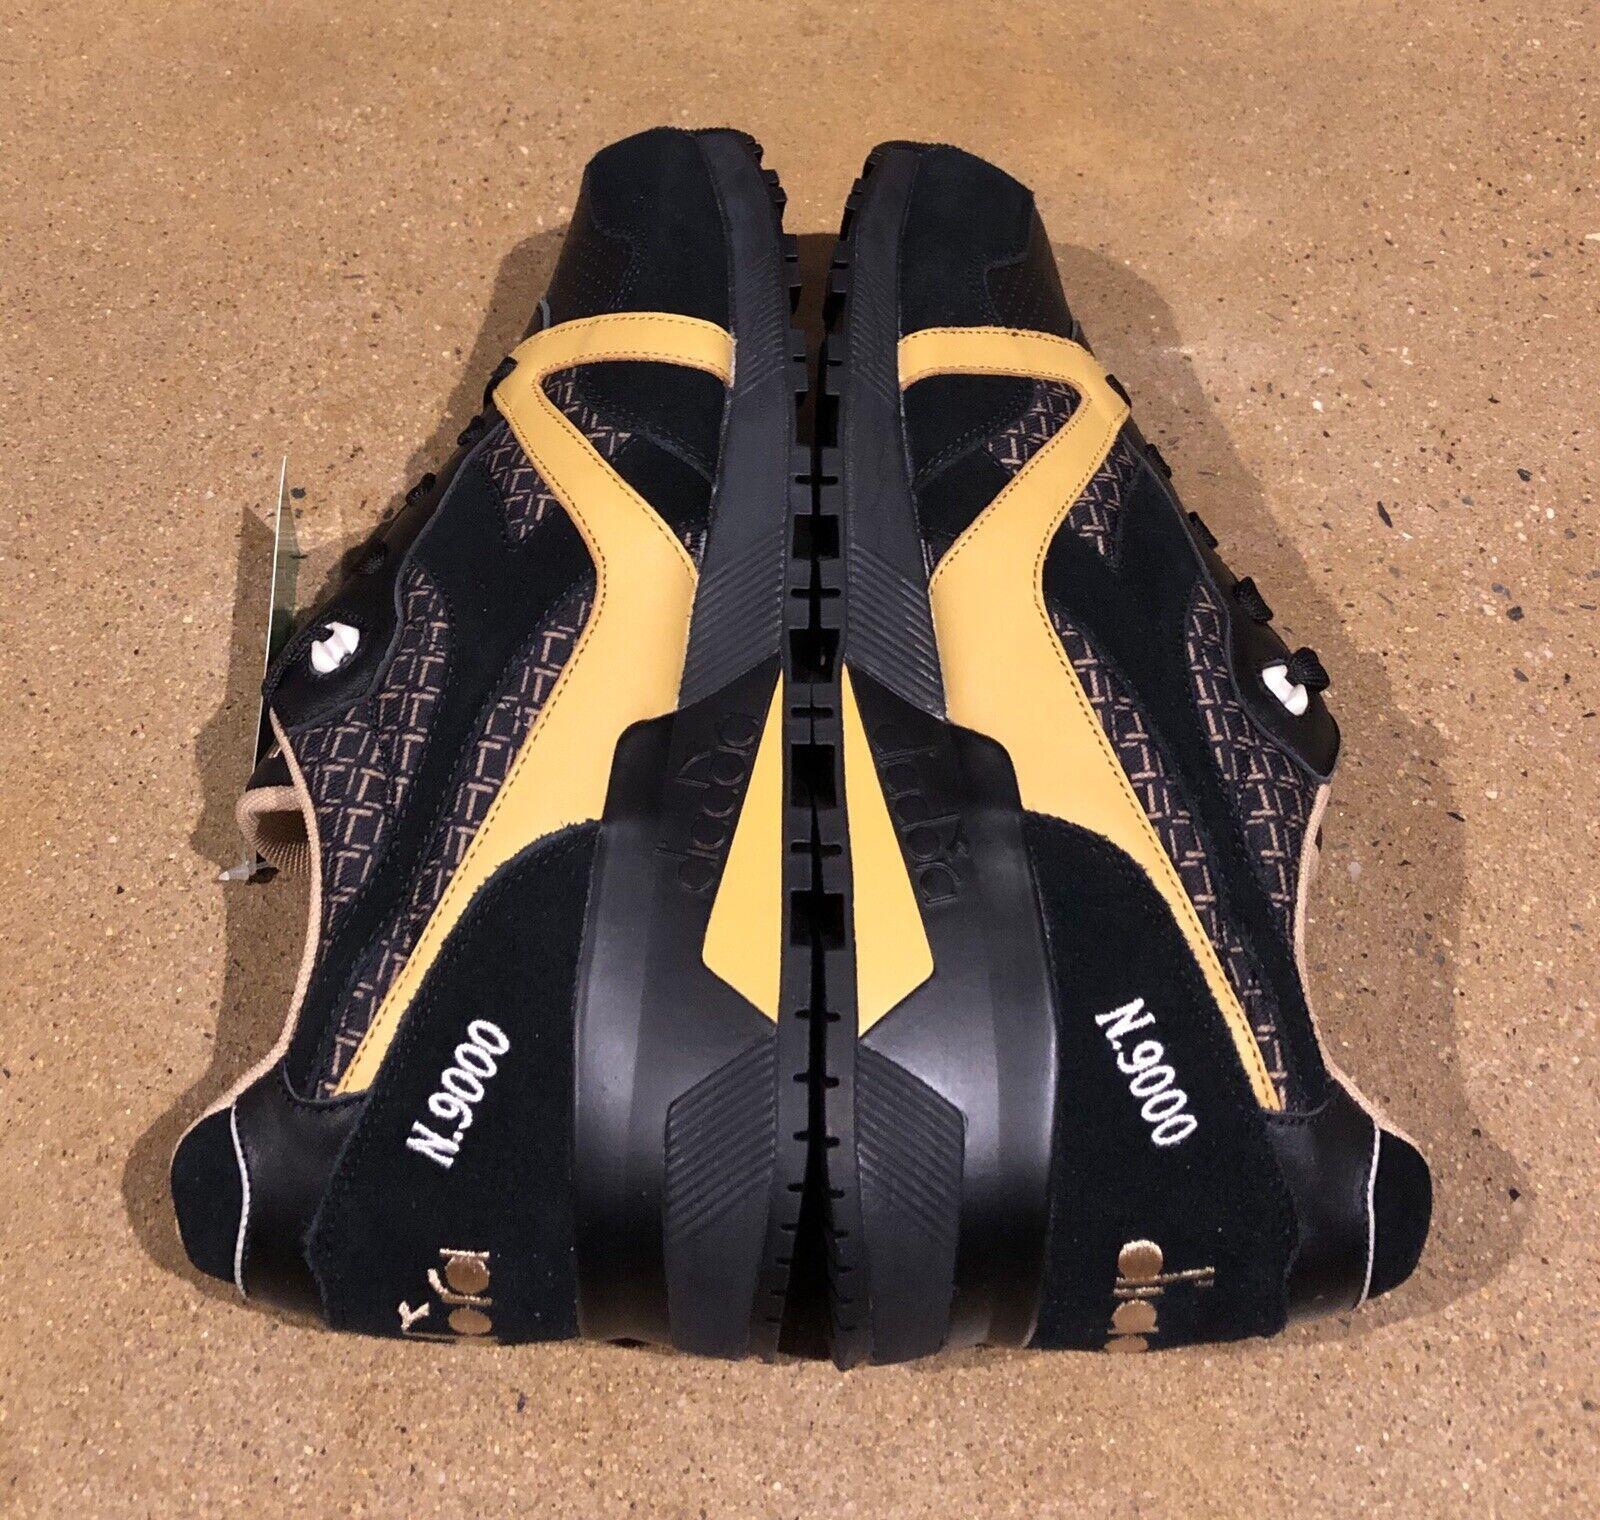 Diadora N9000 Little  oro Negro Tamaño 12 Running Zapatos TENIS DEADSTOCK